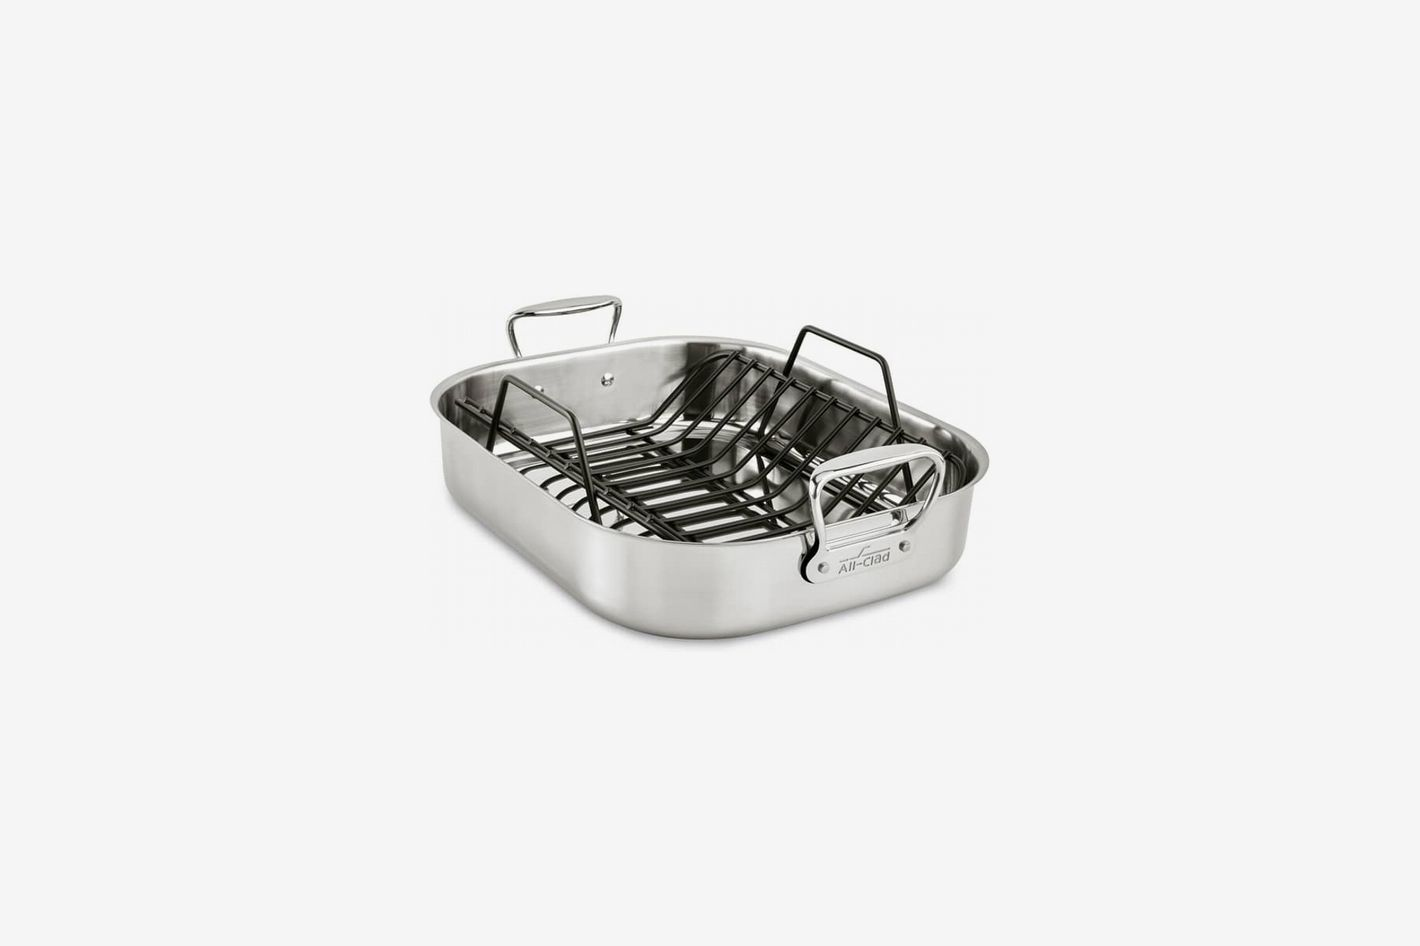 All-Clad Large Stainless Steel Roasting Pan & Roaster Rack